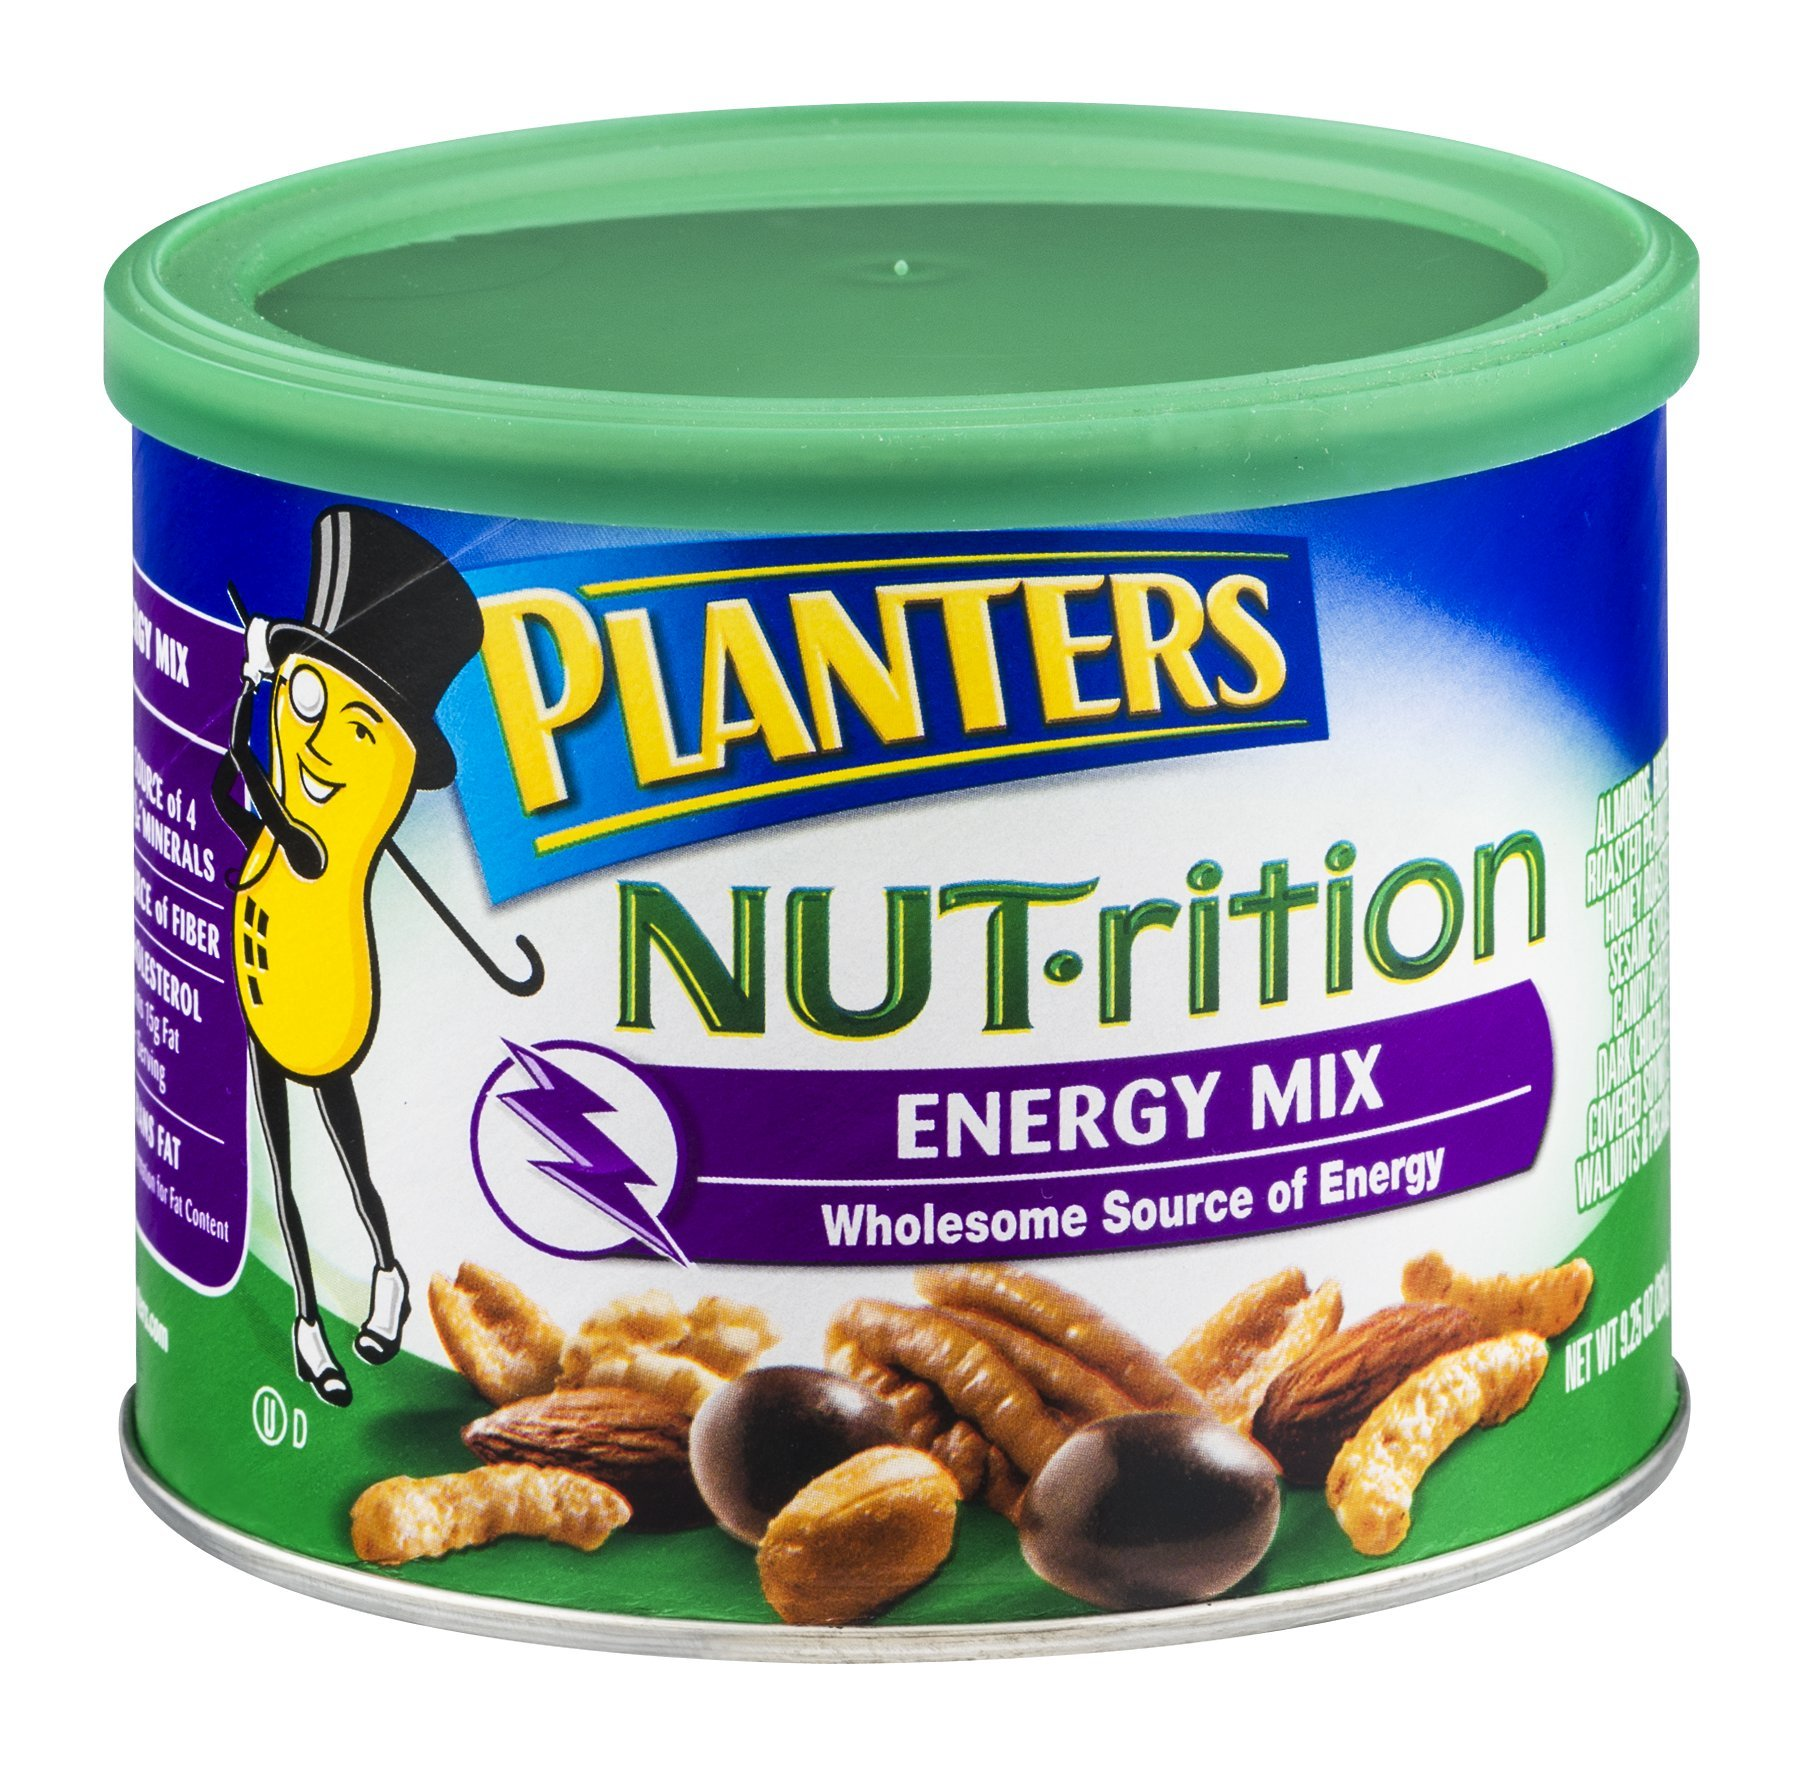 Planters Nutrition Energy Nut Mix, 9.25 Ounce -- 12 per case.